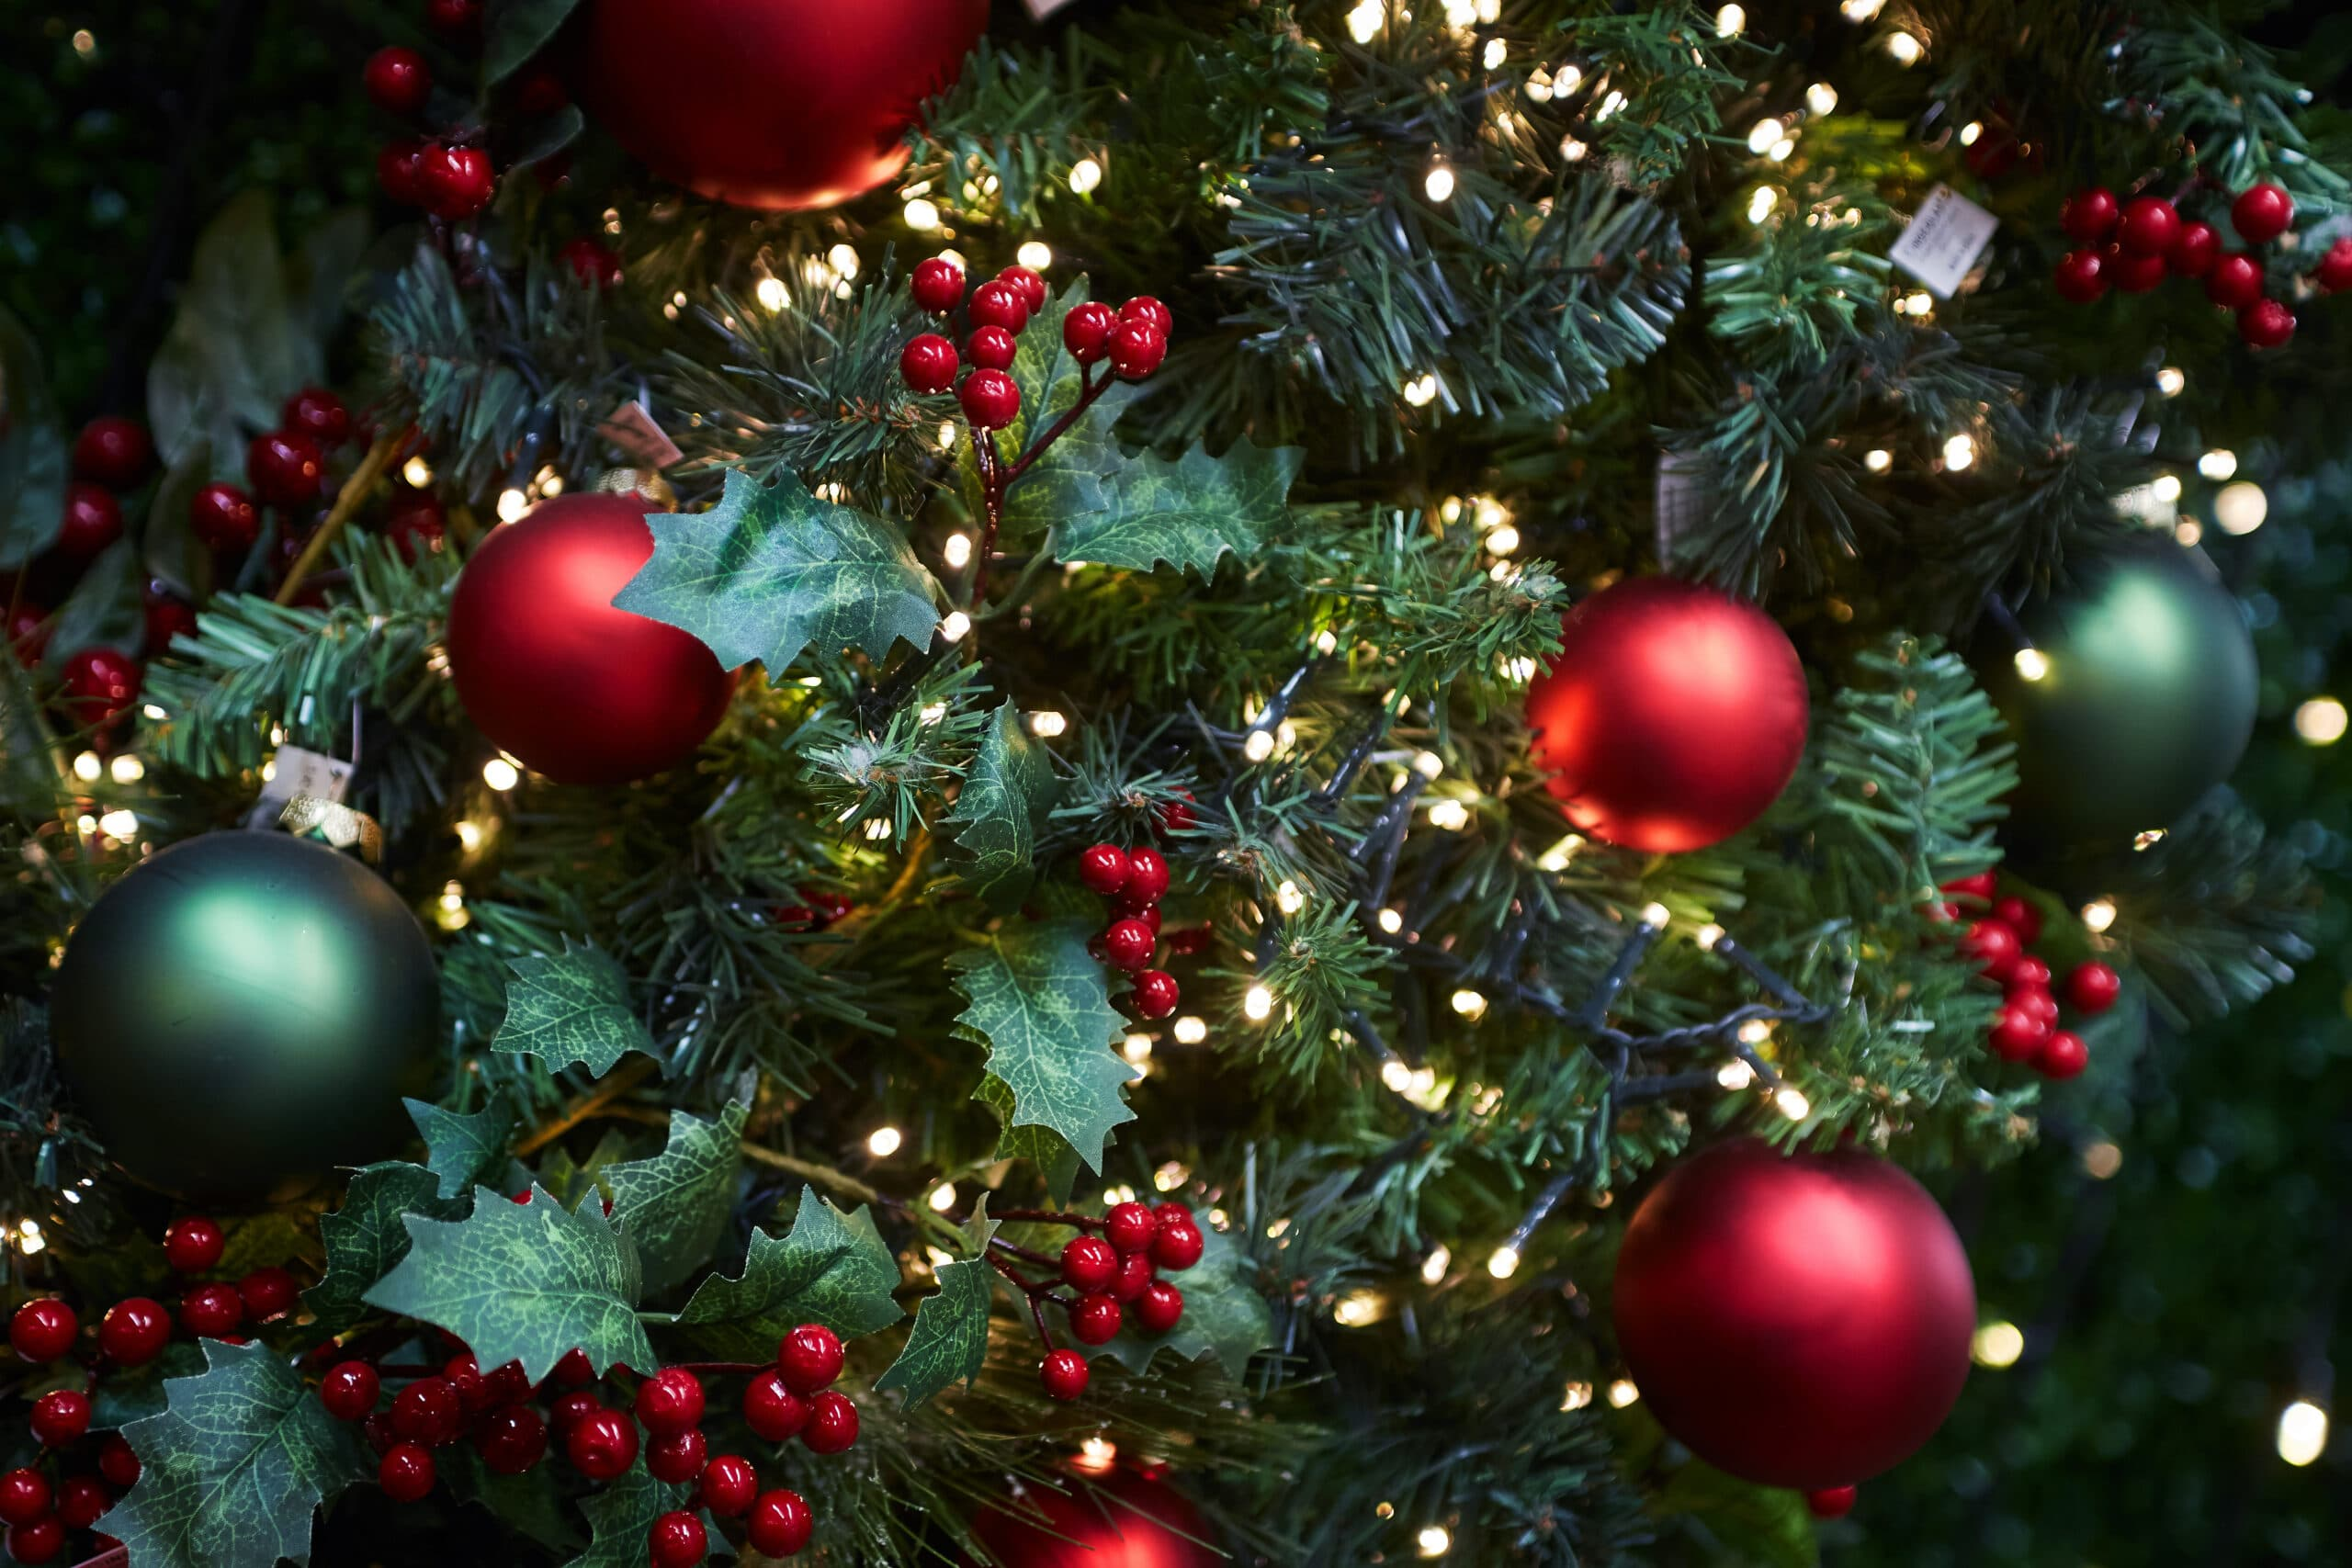 Árvore de Natal toda decorada